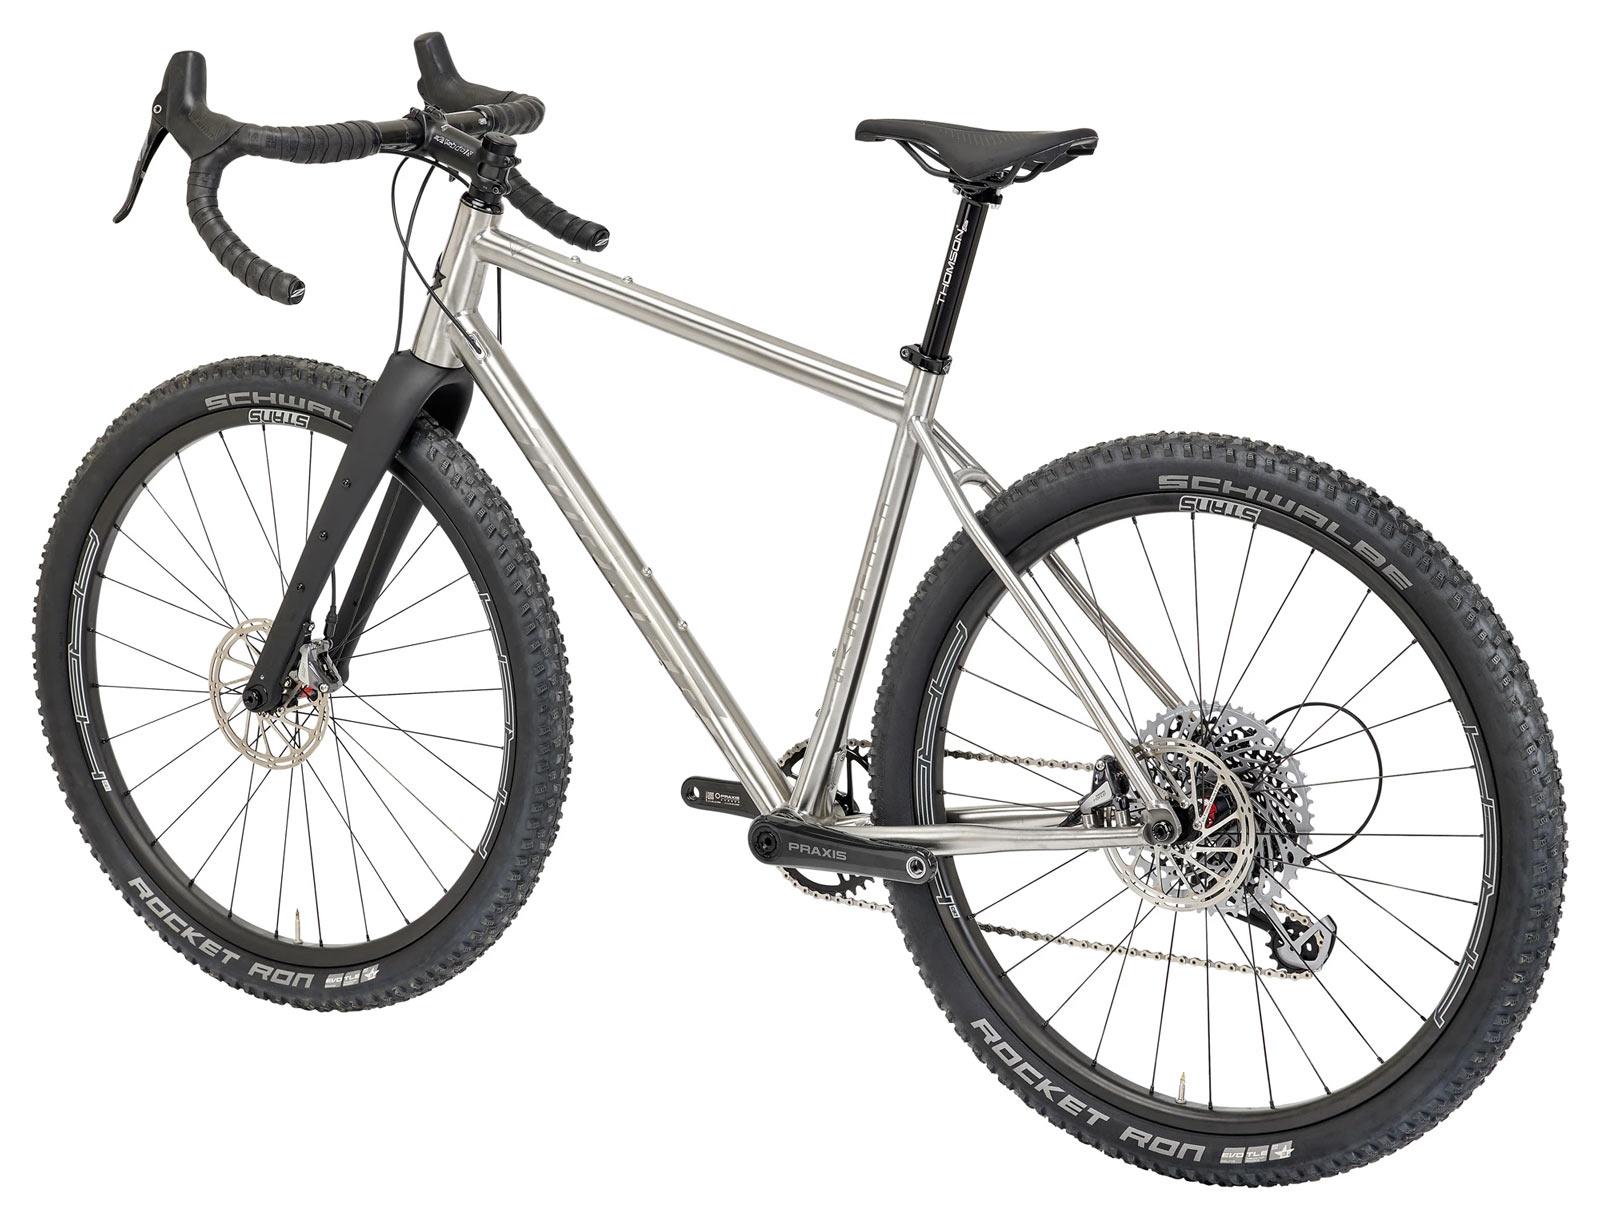 non drive side view of 2022 turner cyclosys titanium gravel bike